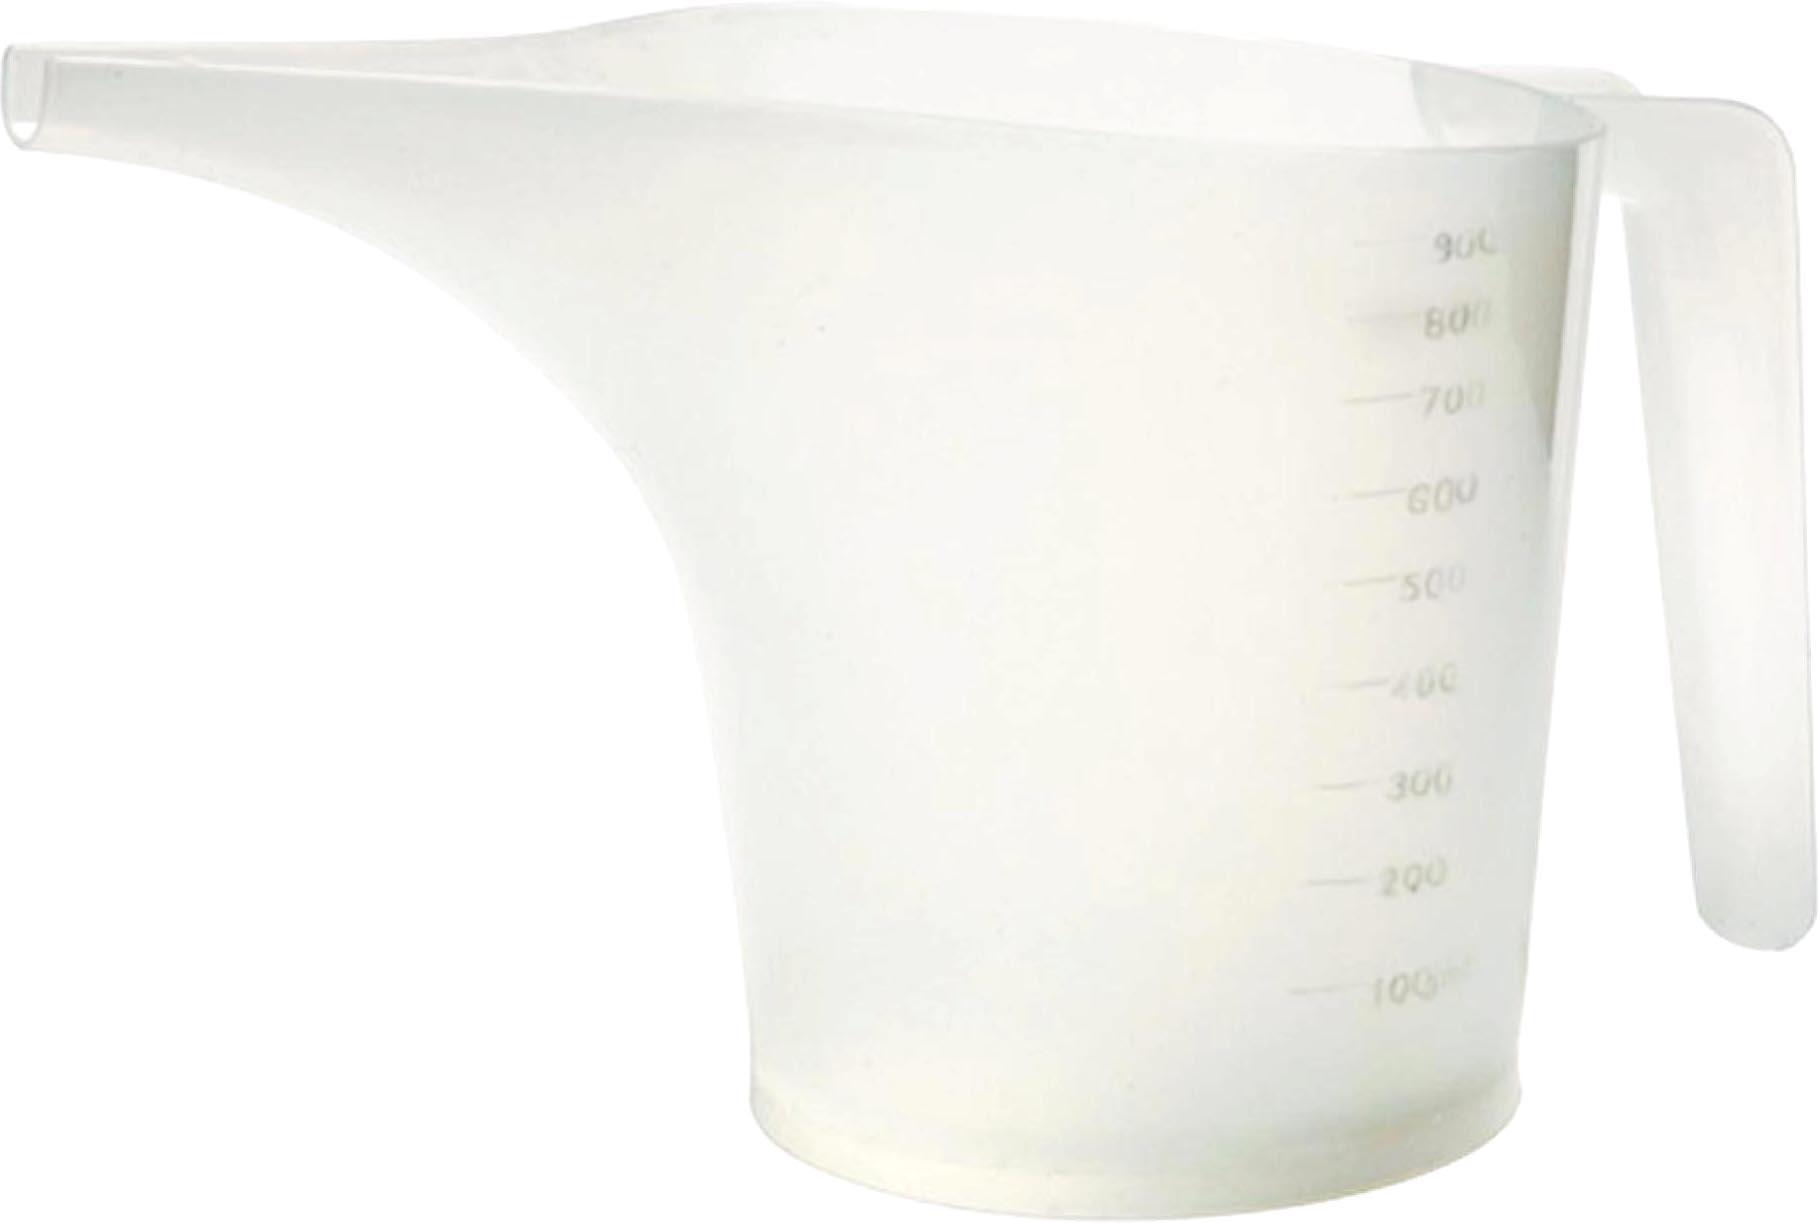 Norpro Measuring Funnel Cupcake Batter Dispensing Pitcher